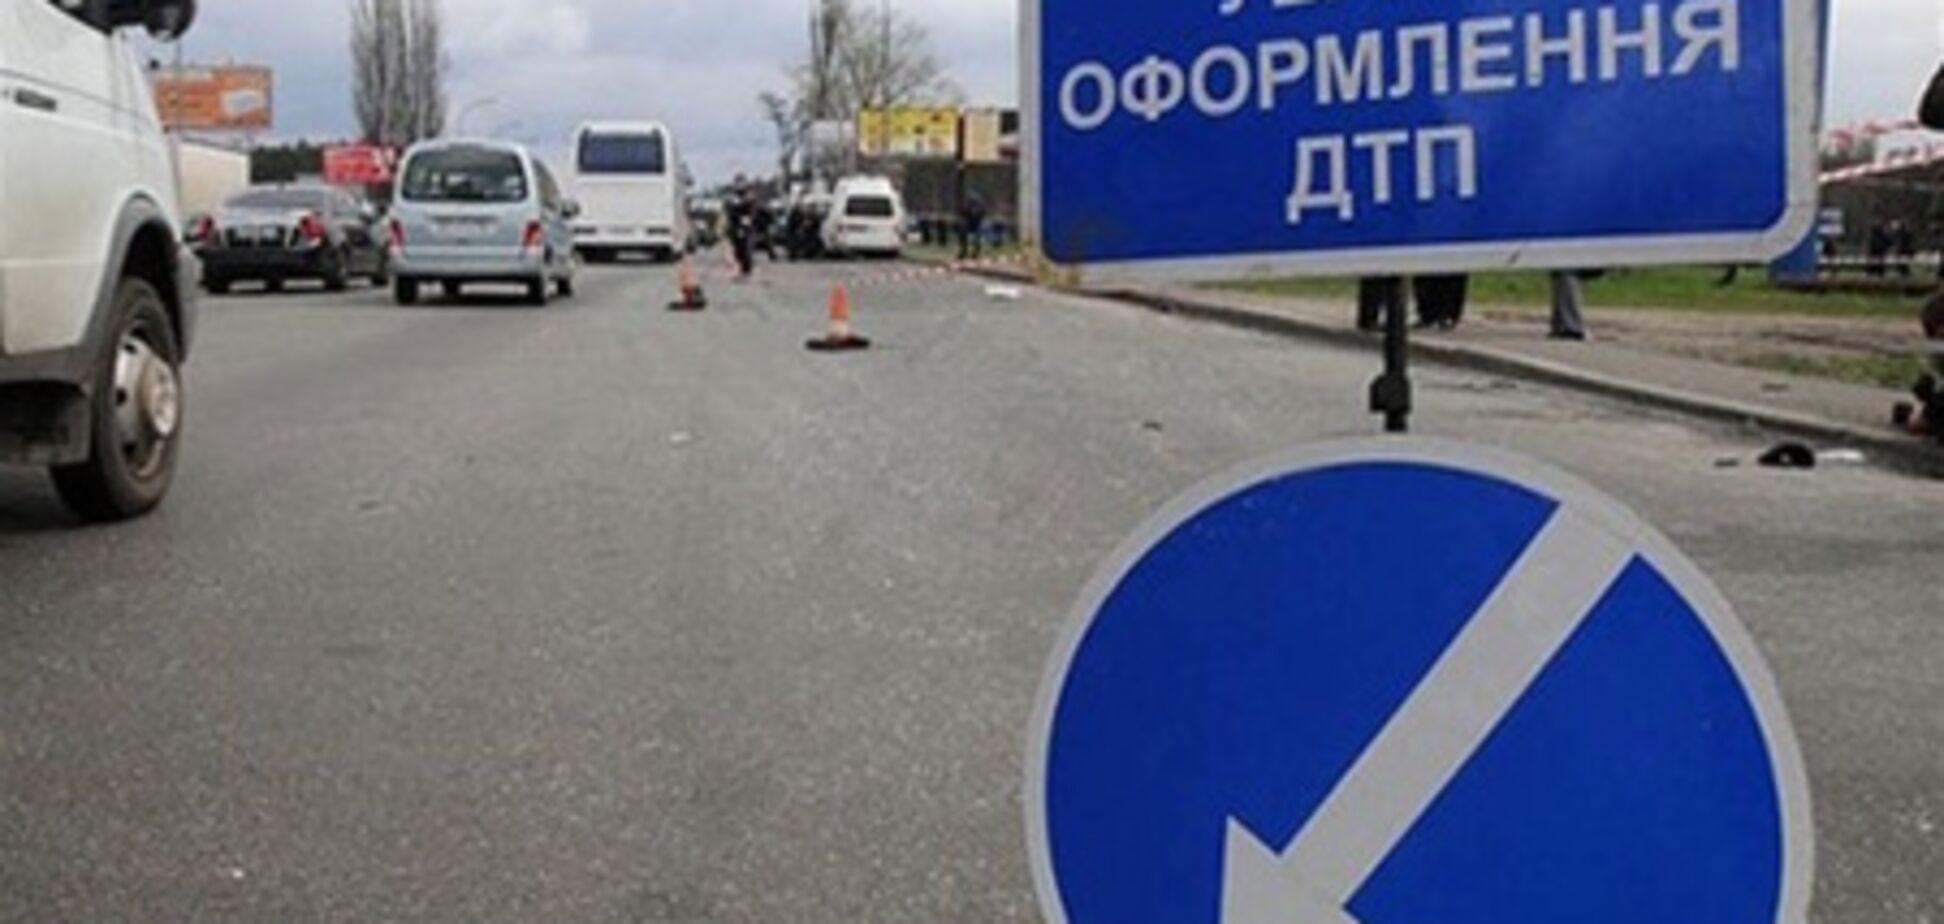 Ситуация на дорогах за 23 марта: 64 ДТП, 10 погибших